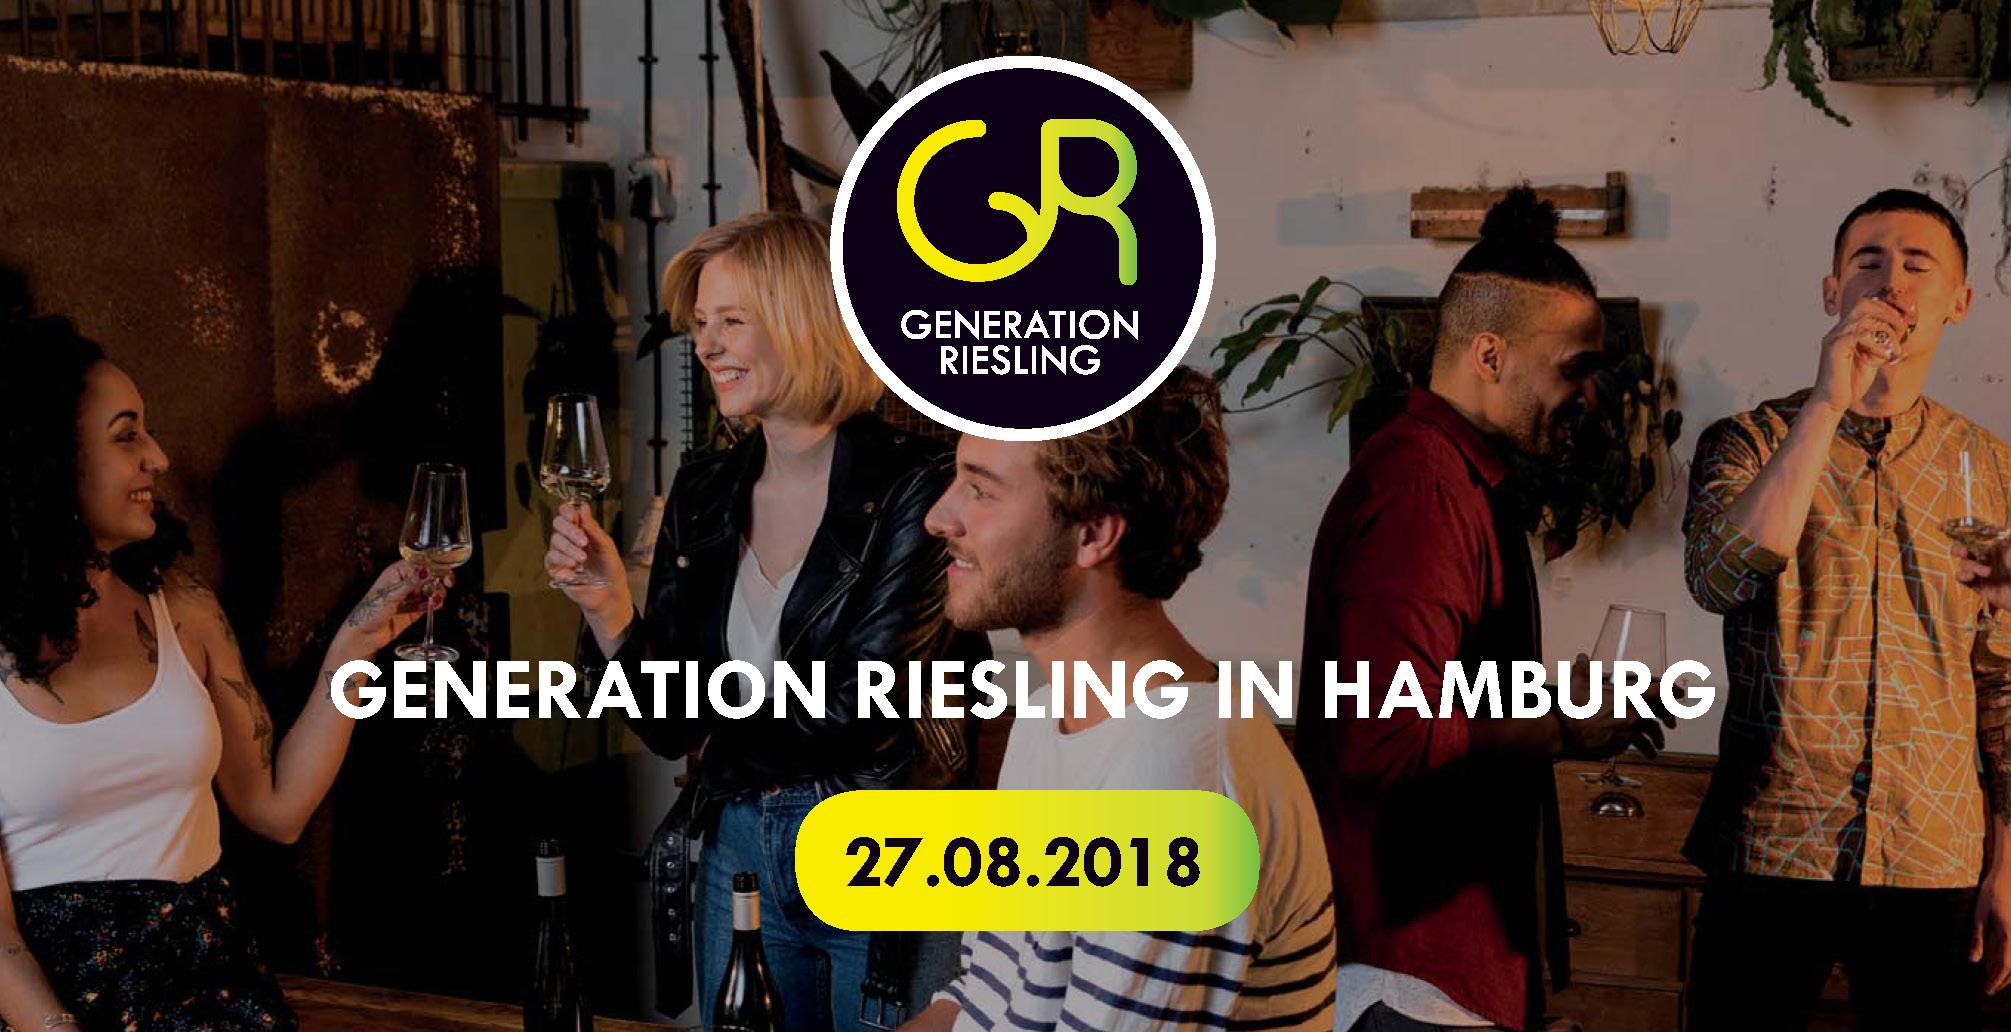 Generation Riesling in Hamburg